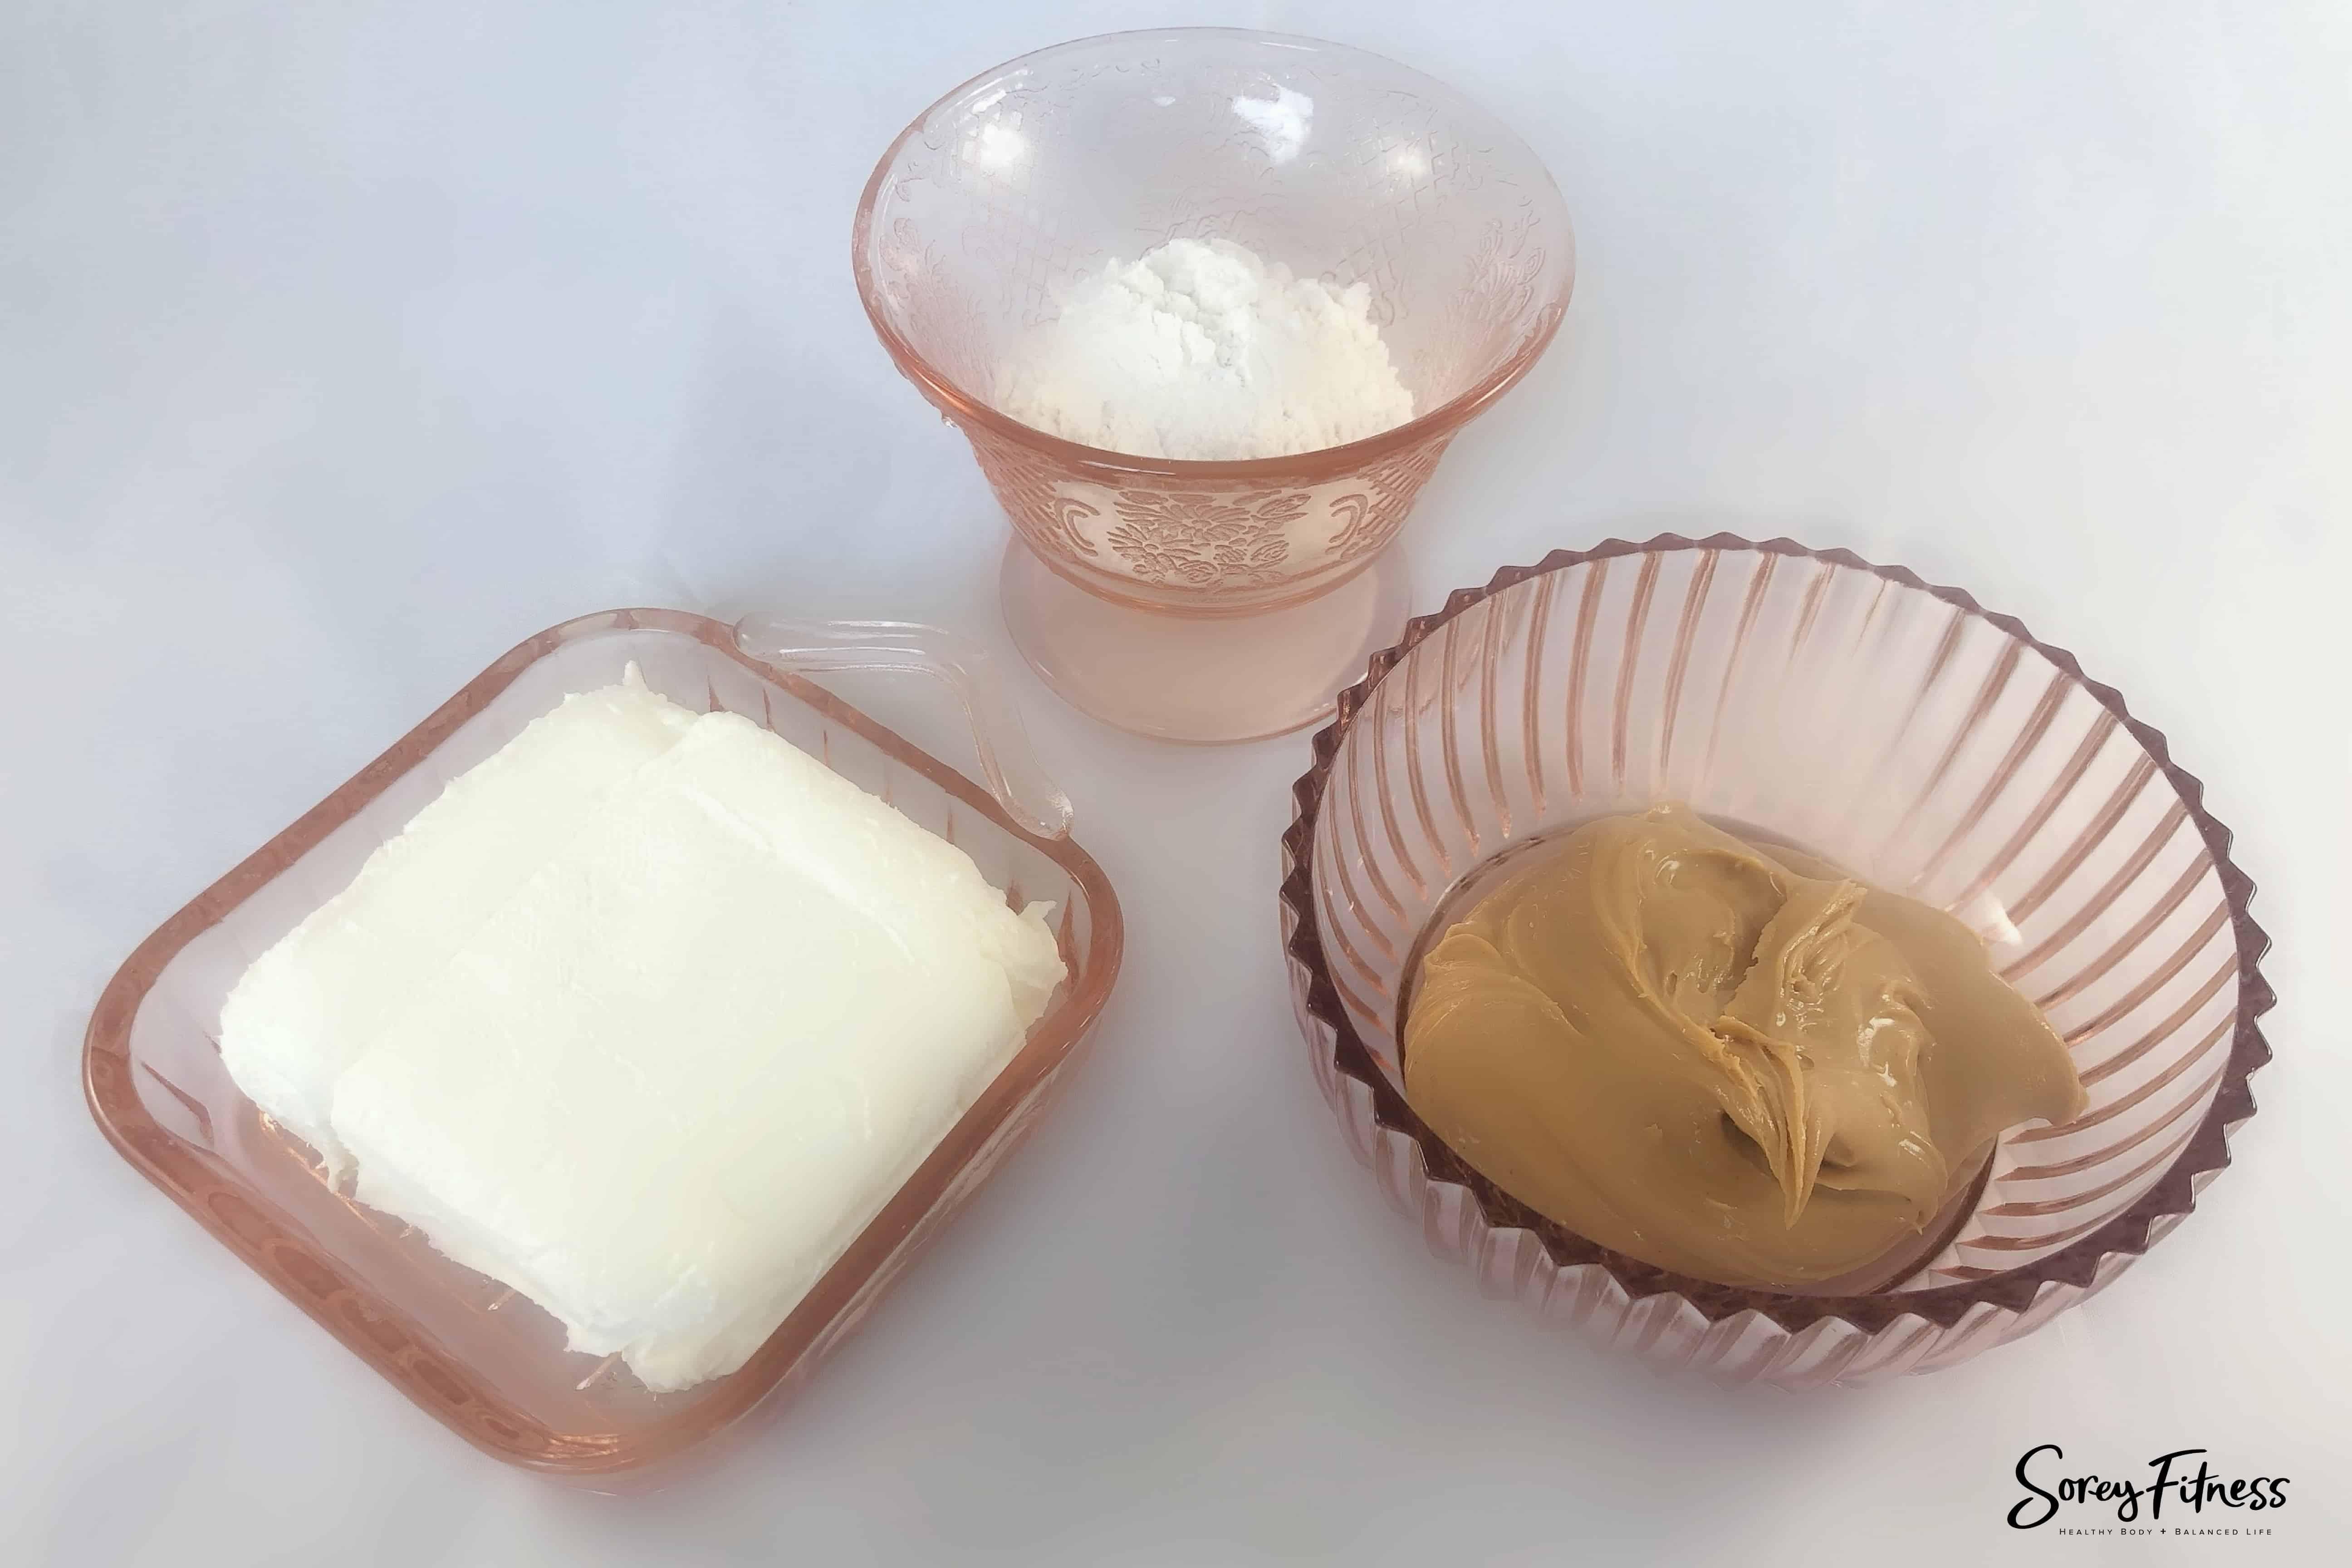 keto peanut butter ball ingredients